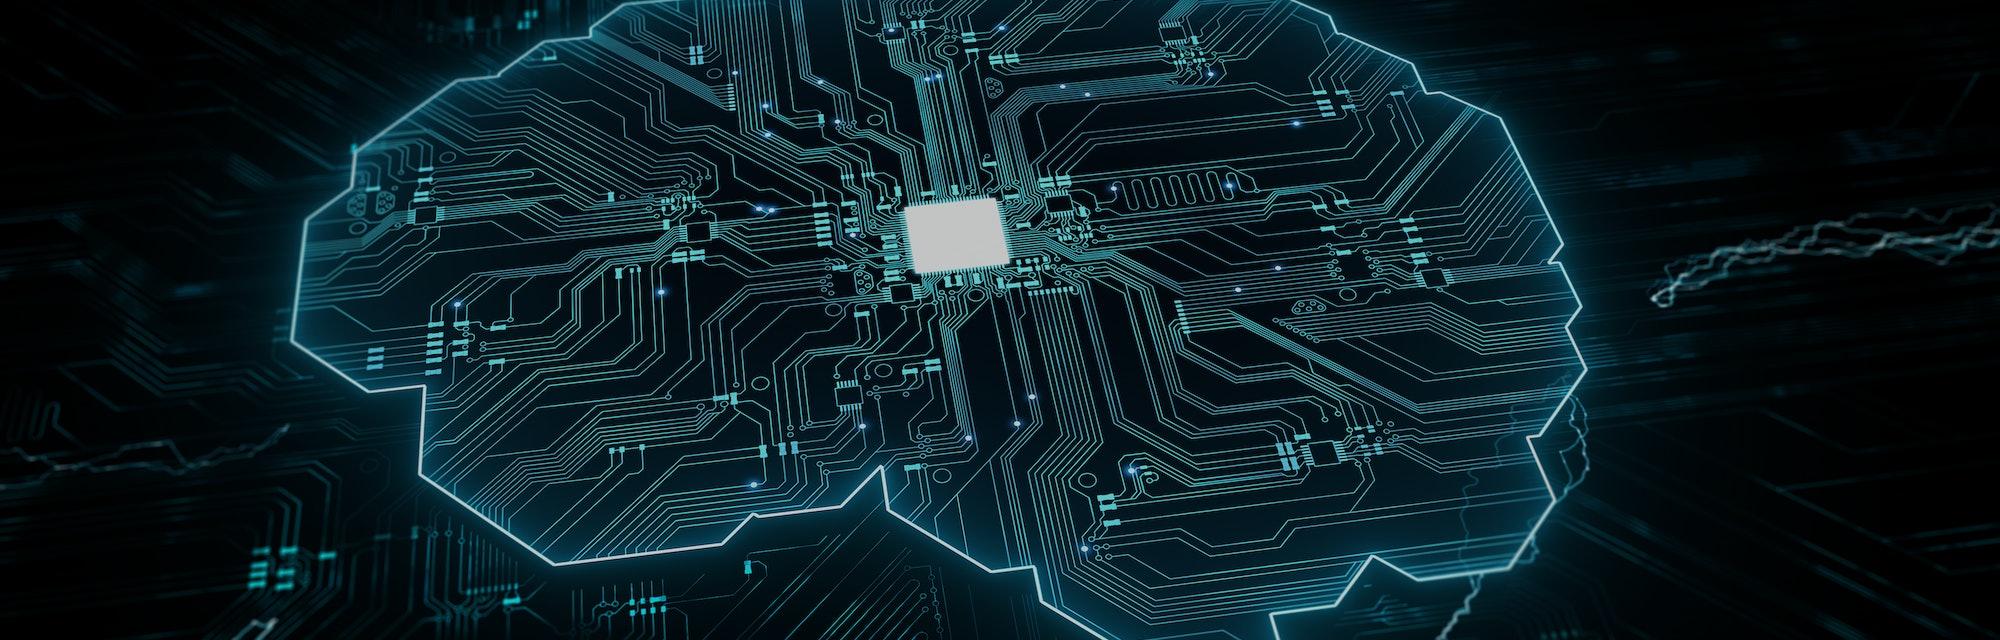 Artificial intelligence (AI), data mining, deep learning modern computer technologies.  Futuristic C...